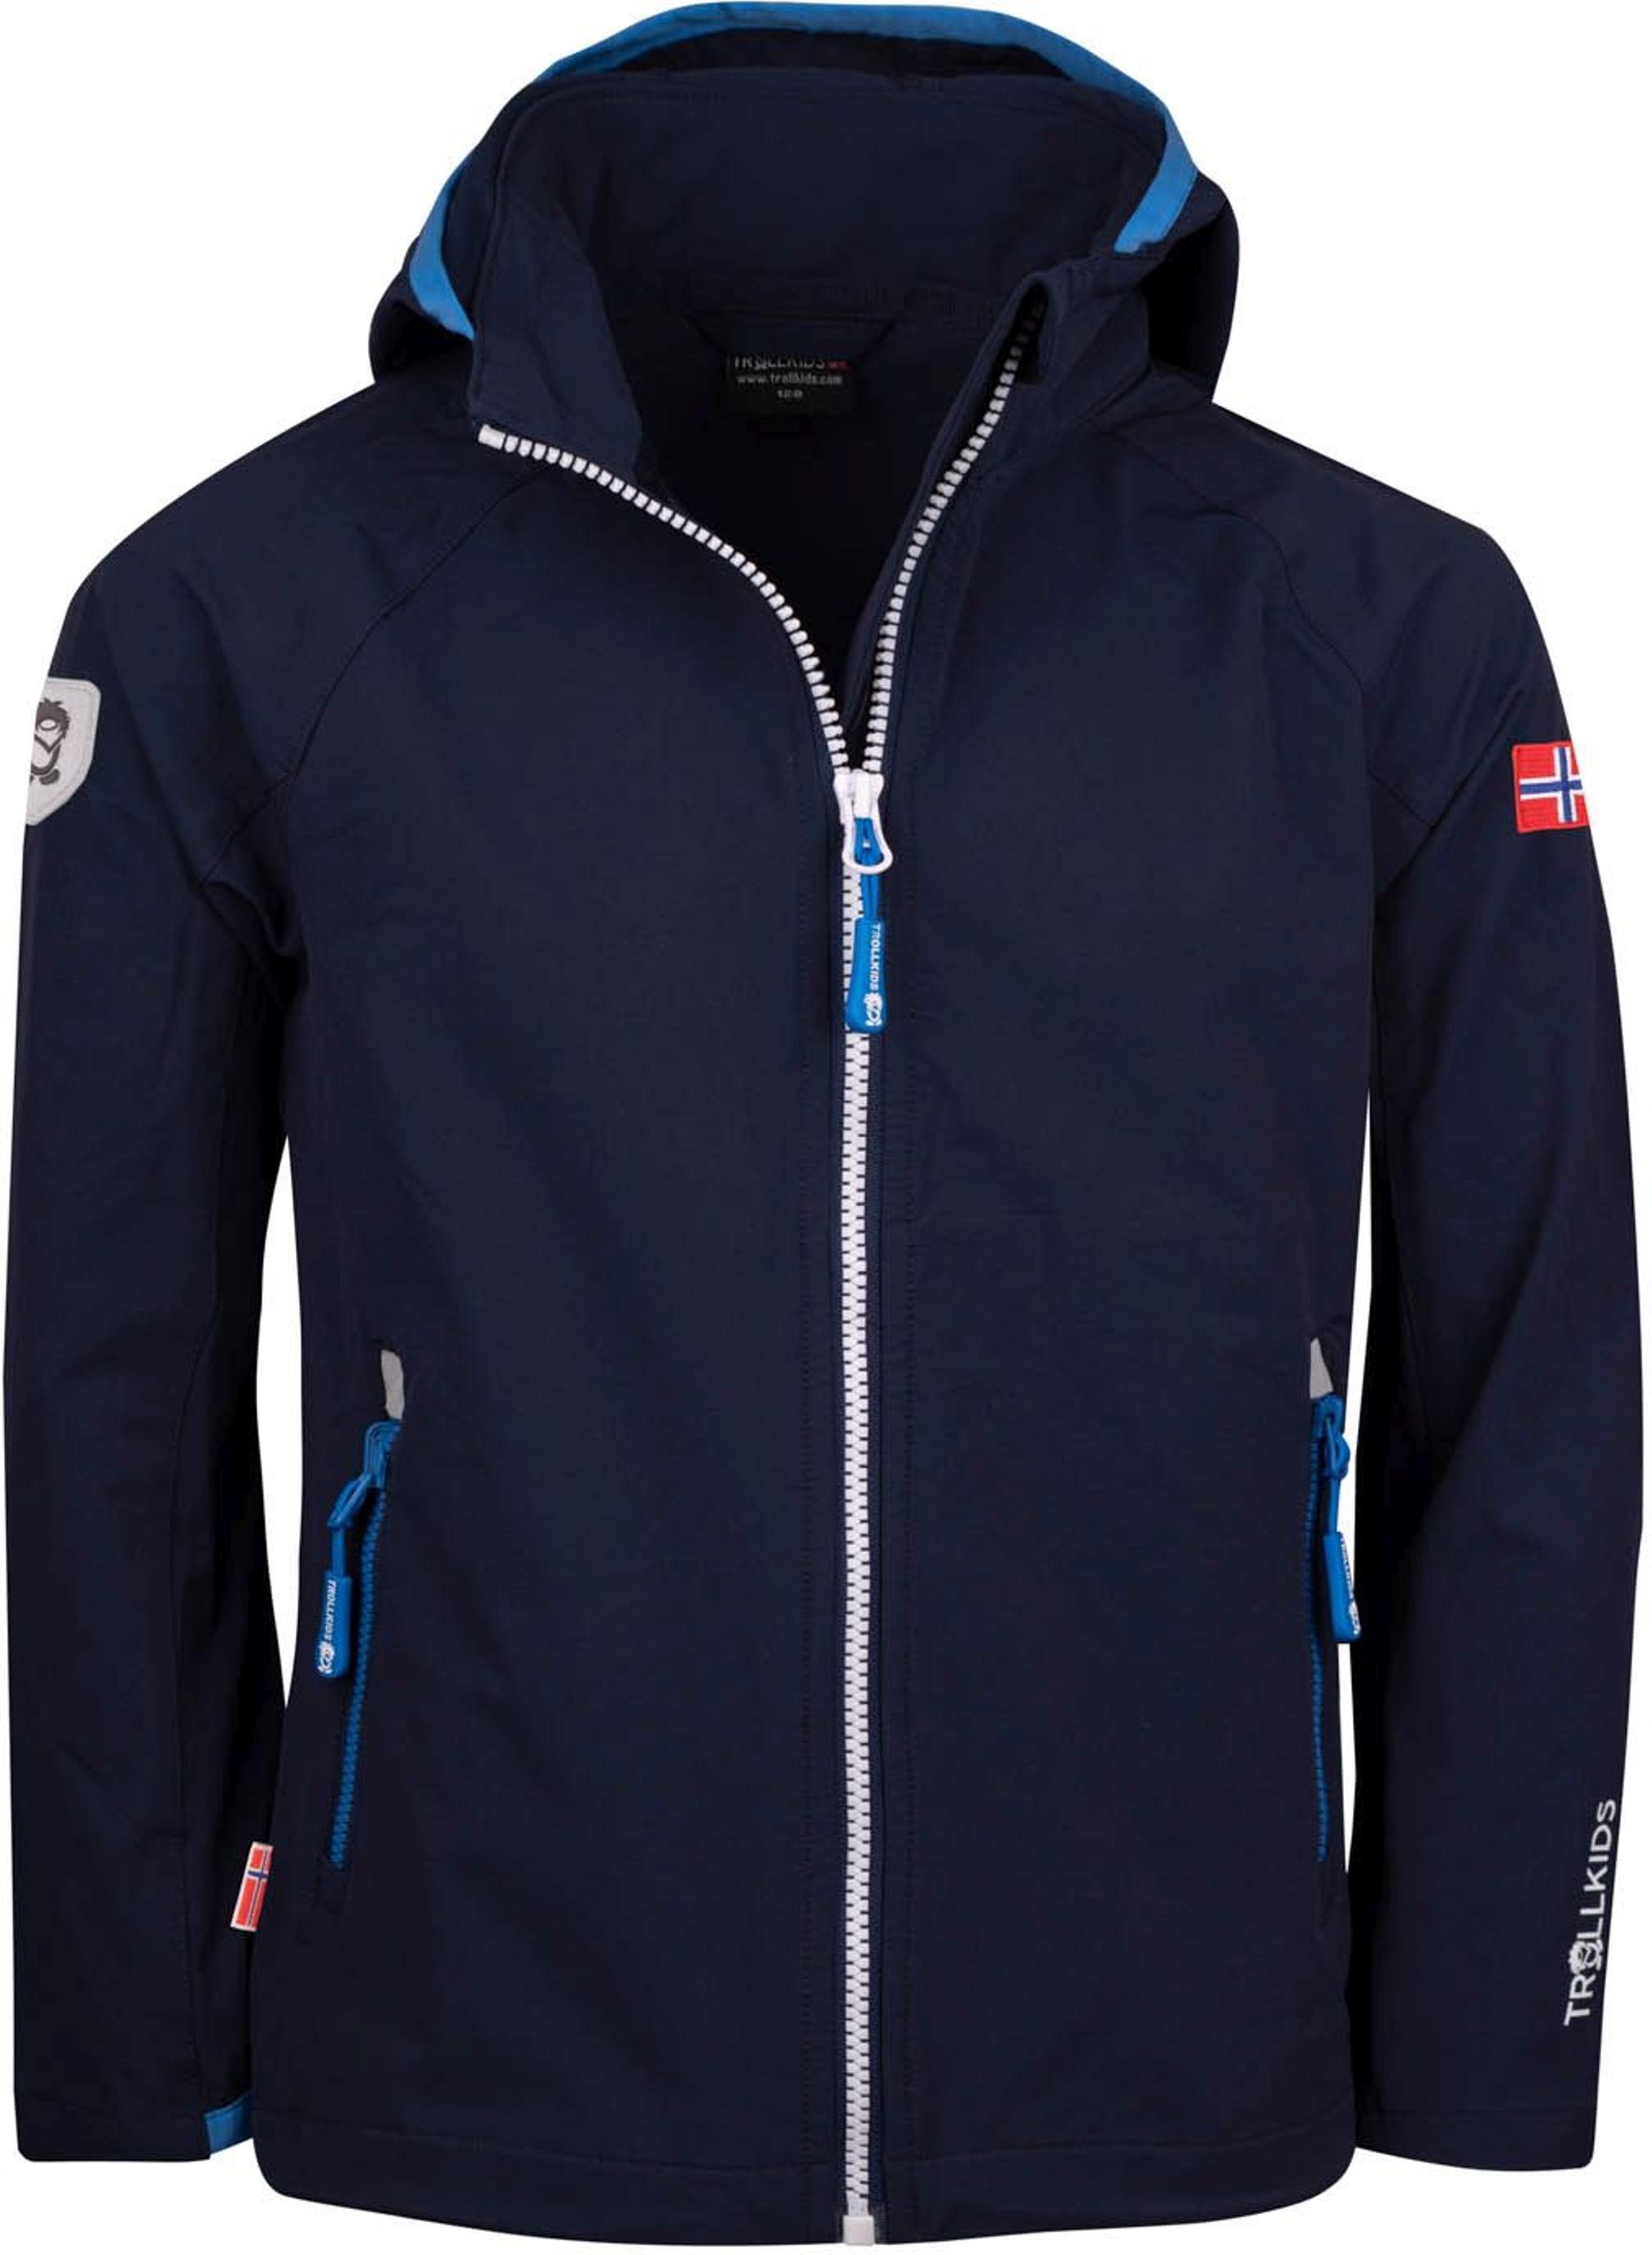 Trollkids Kvalvika Jacket navy/white/med blue